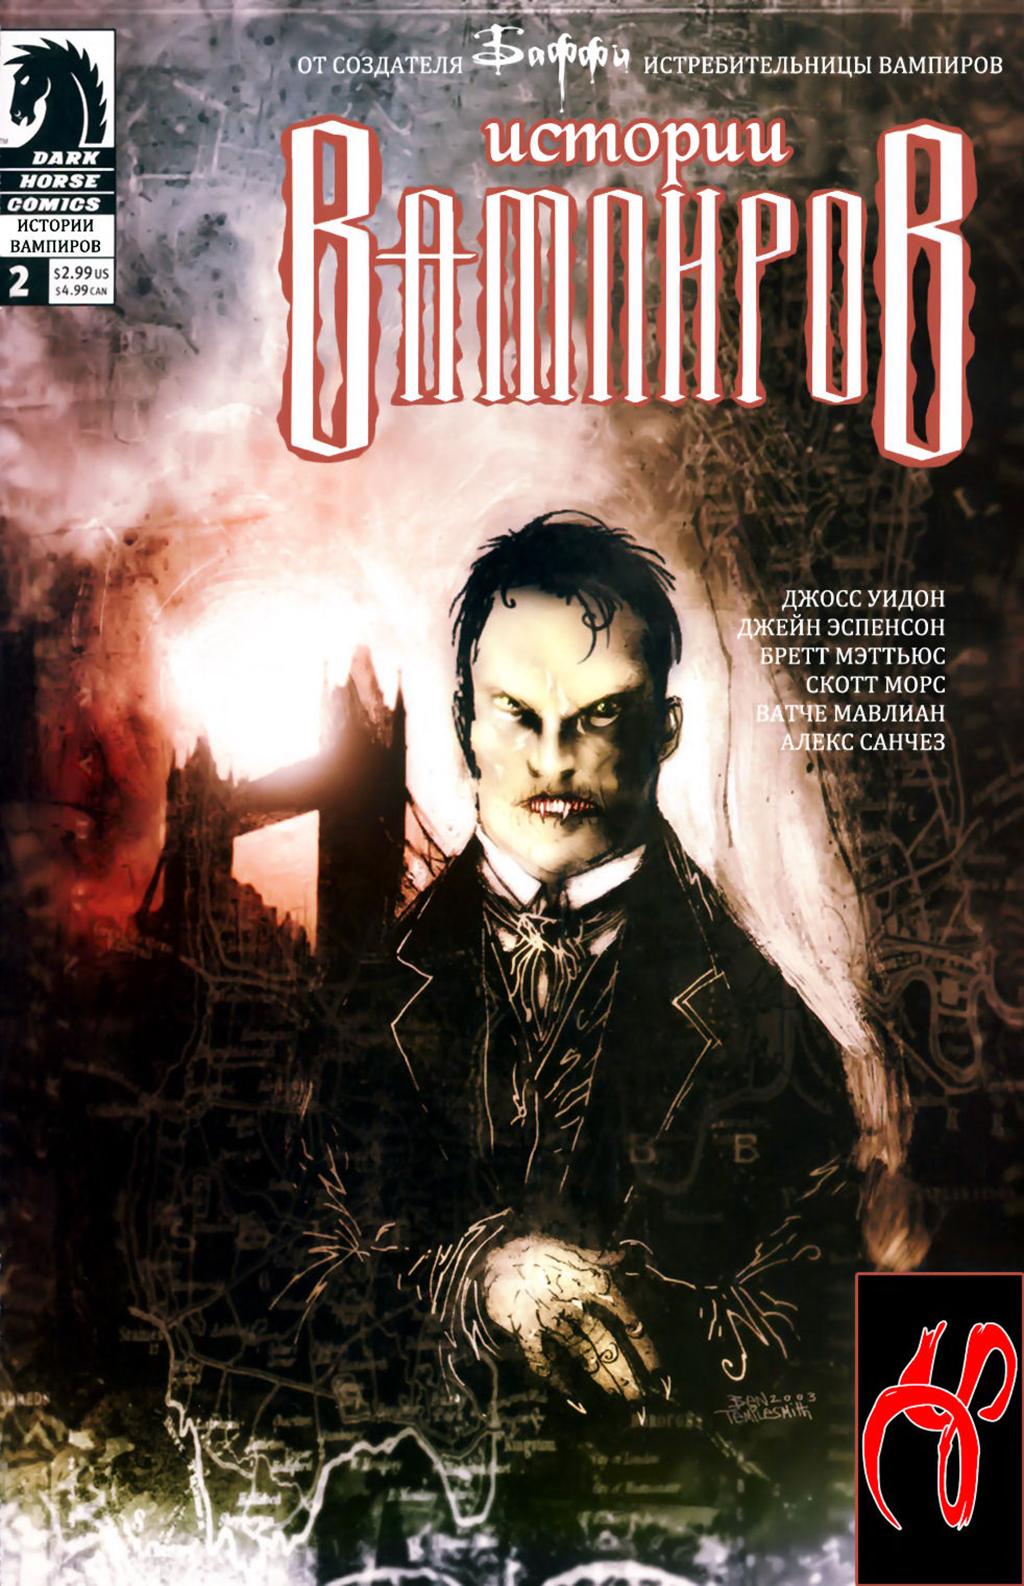 Комикс Истории Вампиров